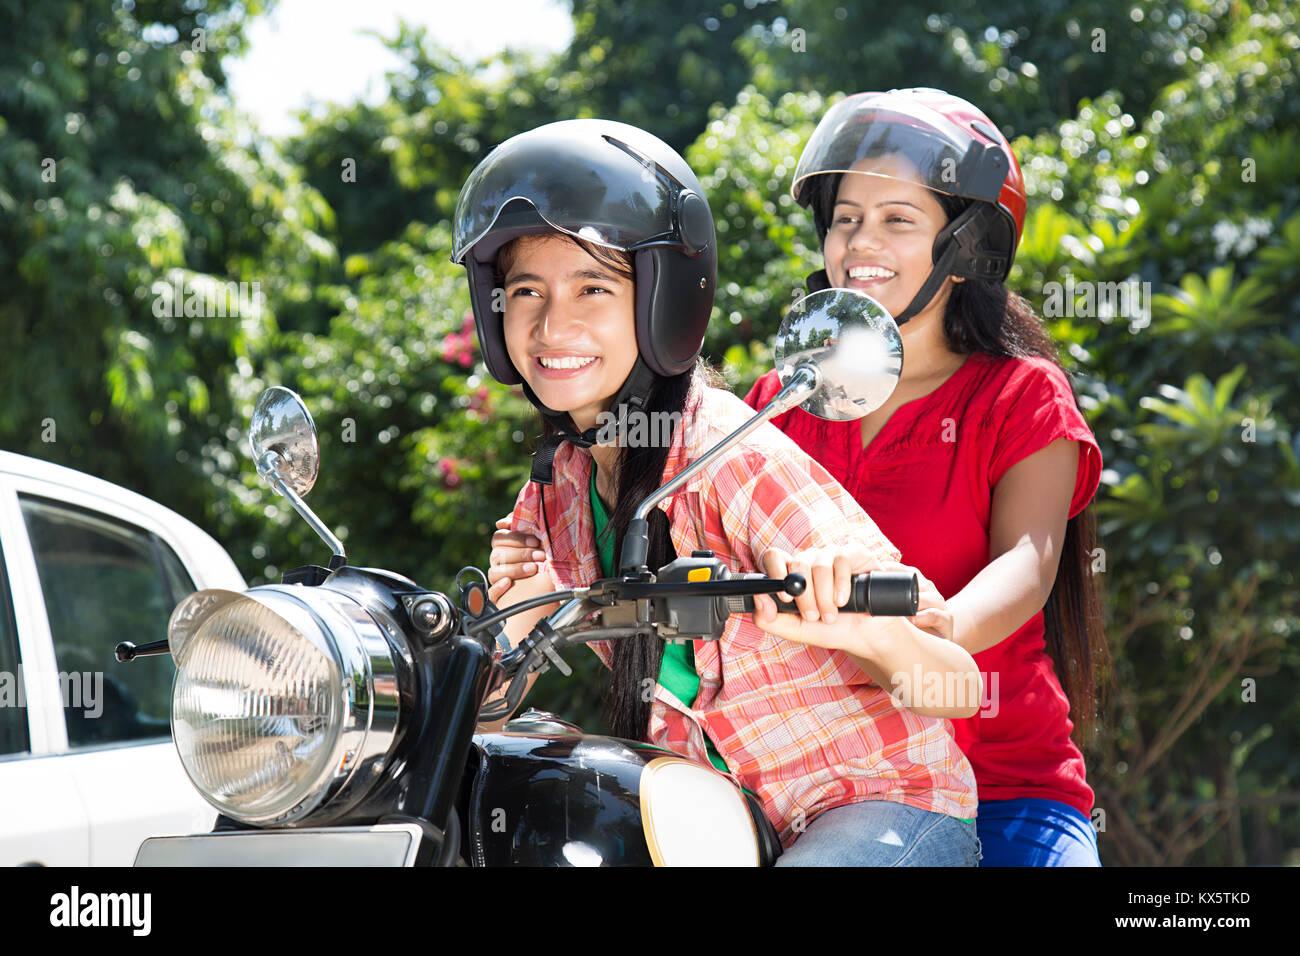 2 Indian Teenager Girls Friend Ride Bike Showing Thumbsup Enjoying